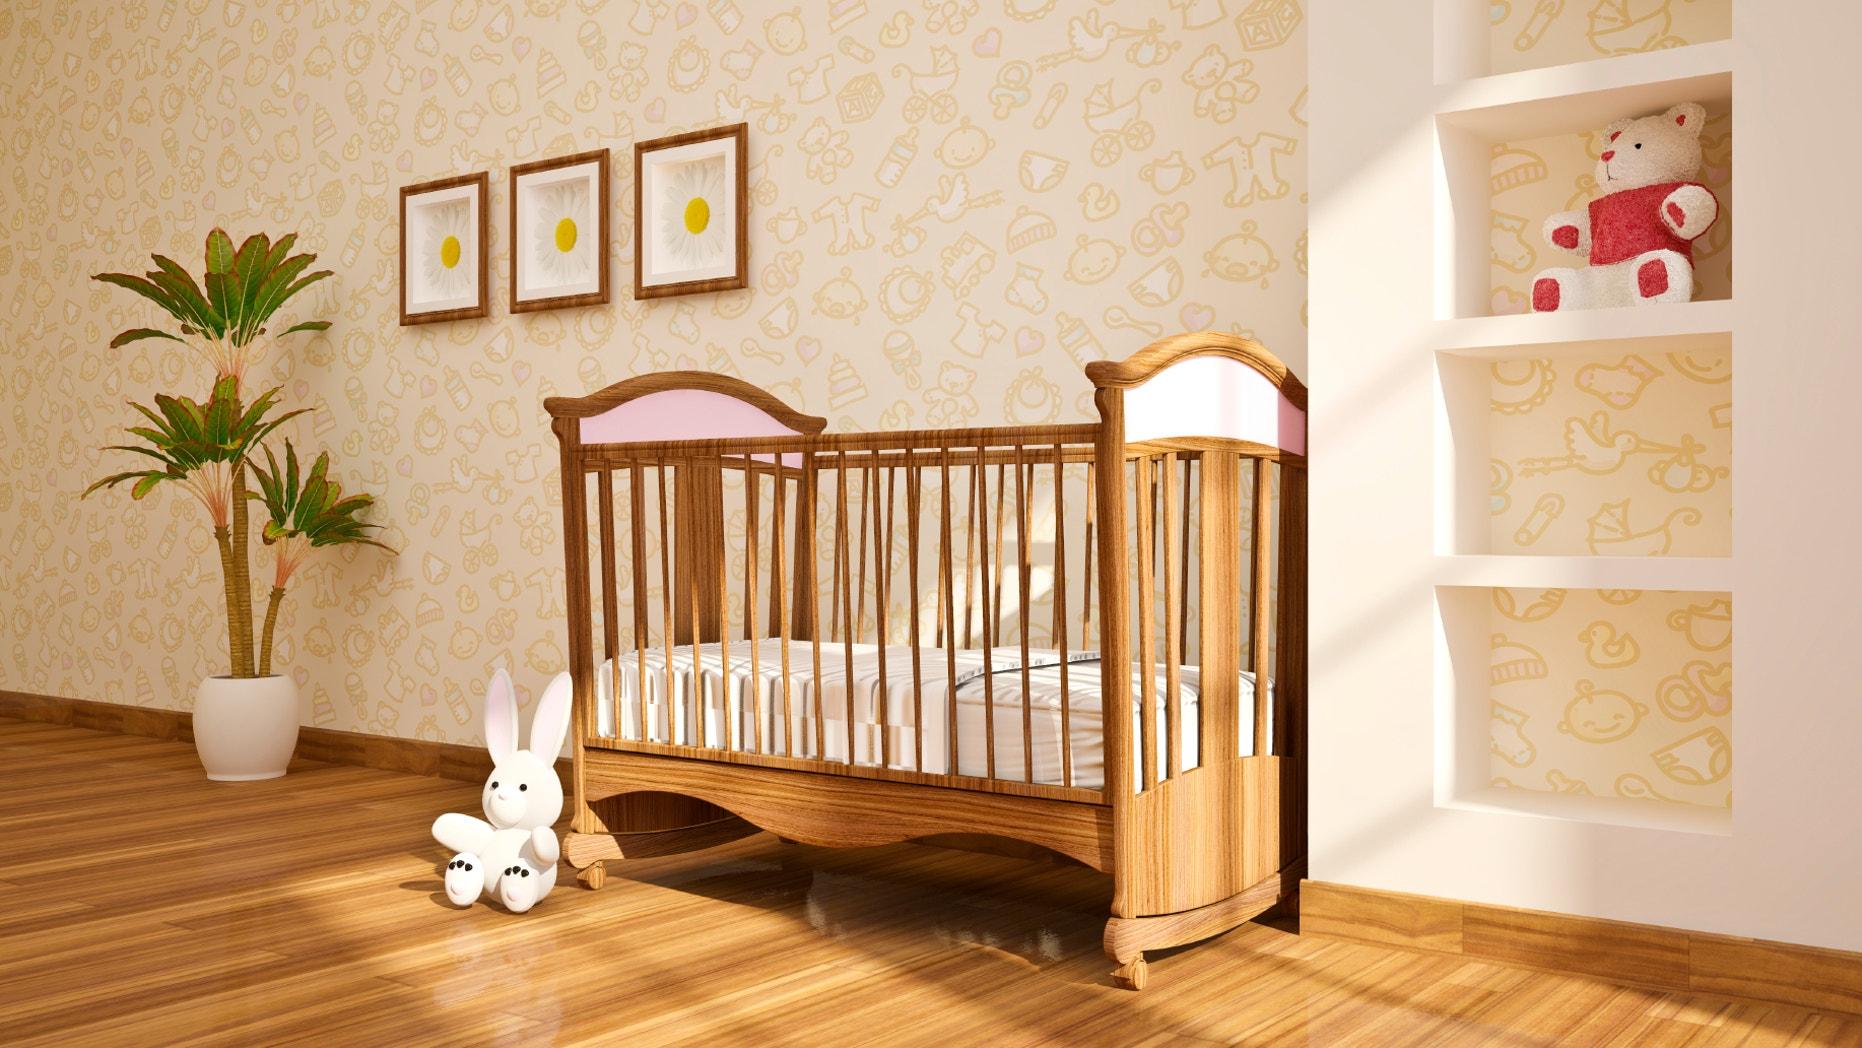 6 tips to buying a safe crib mattress | Fox News